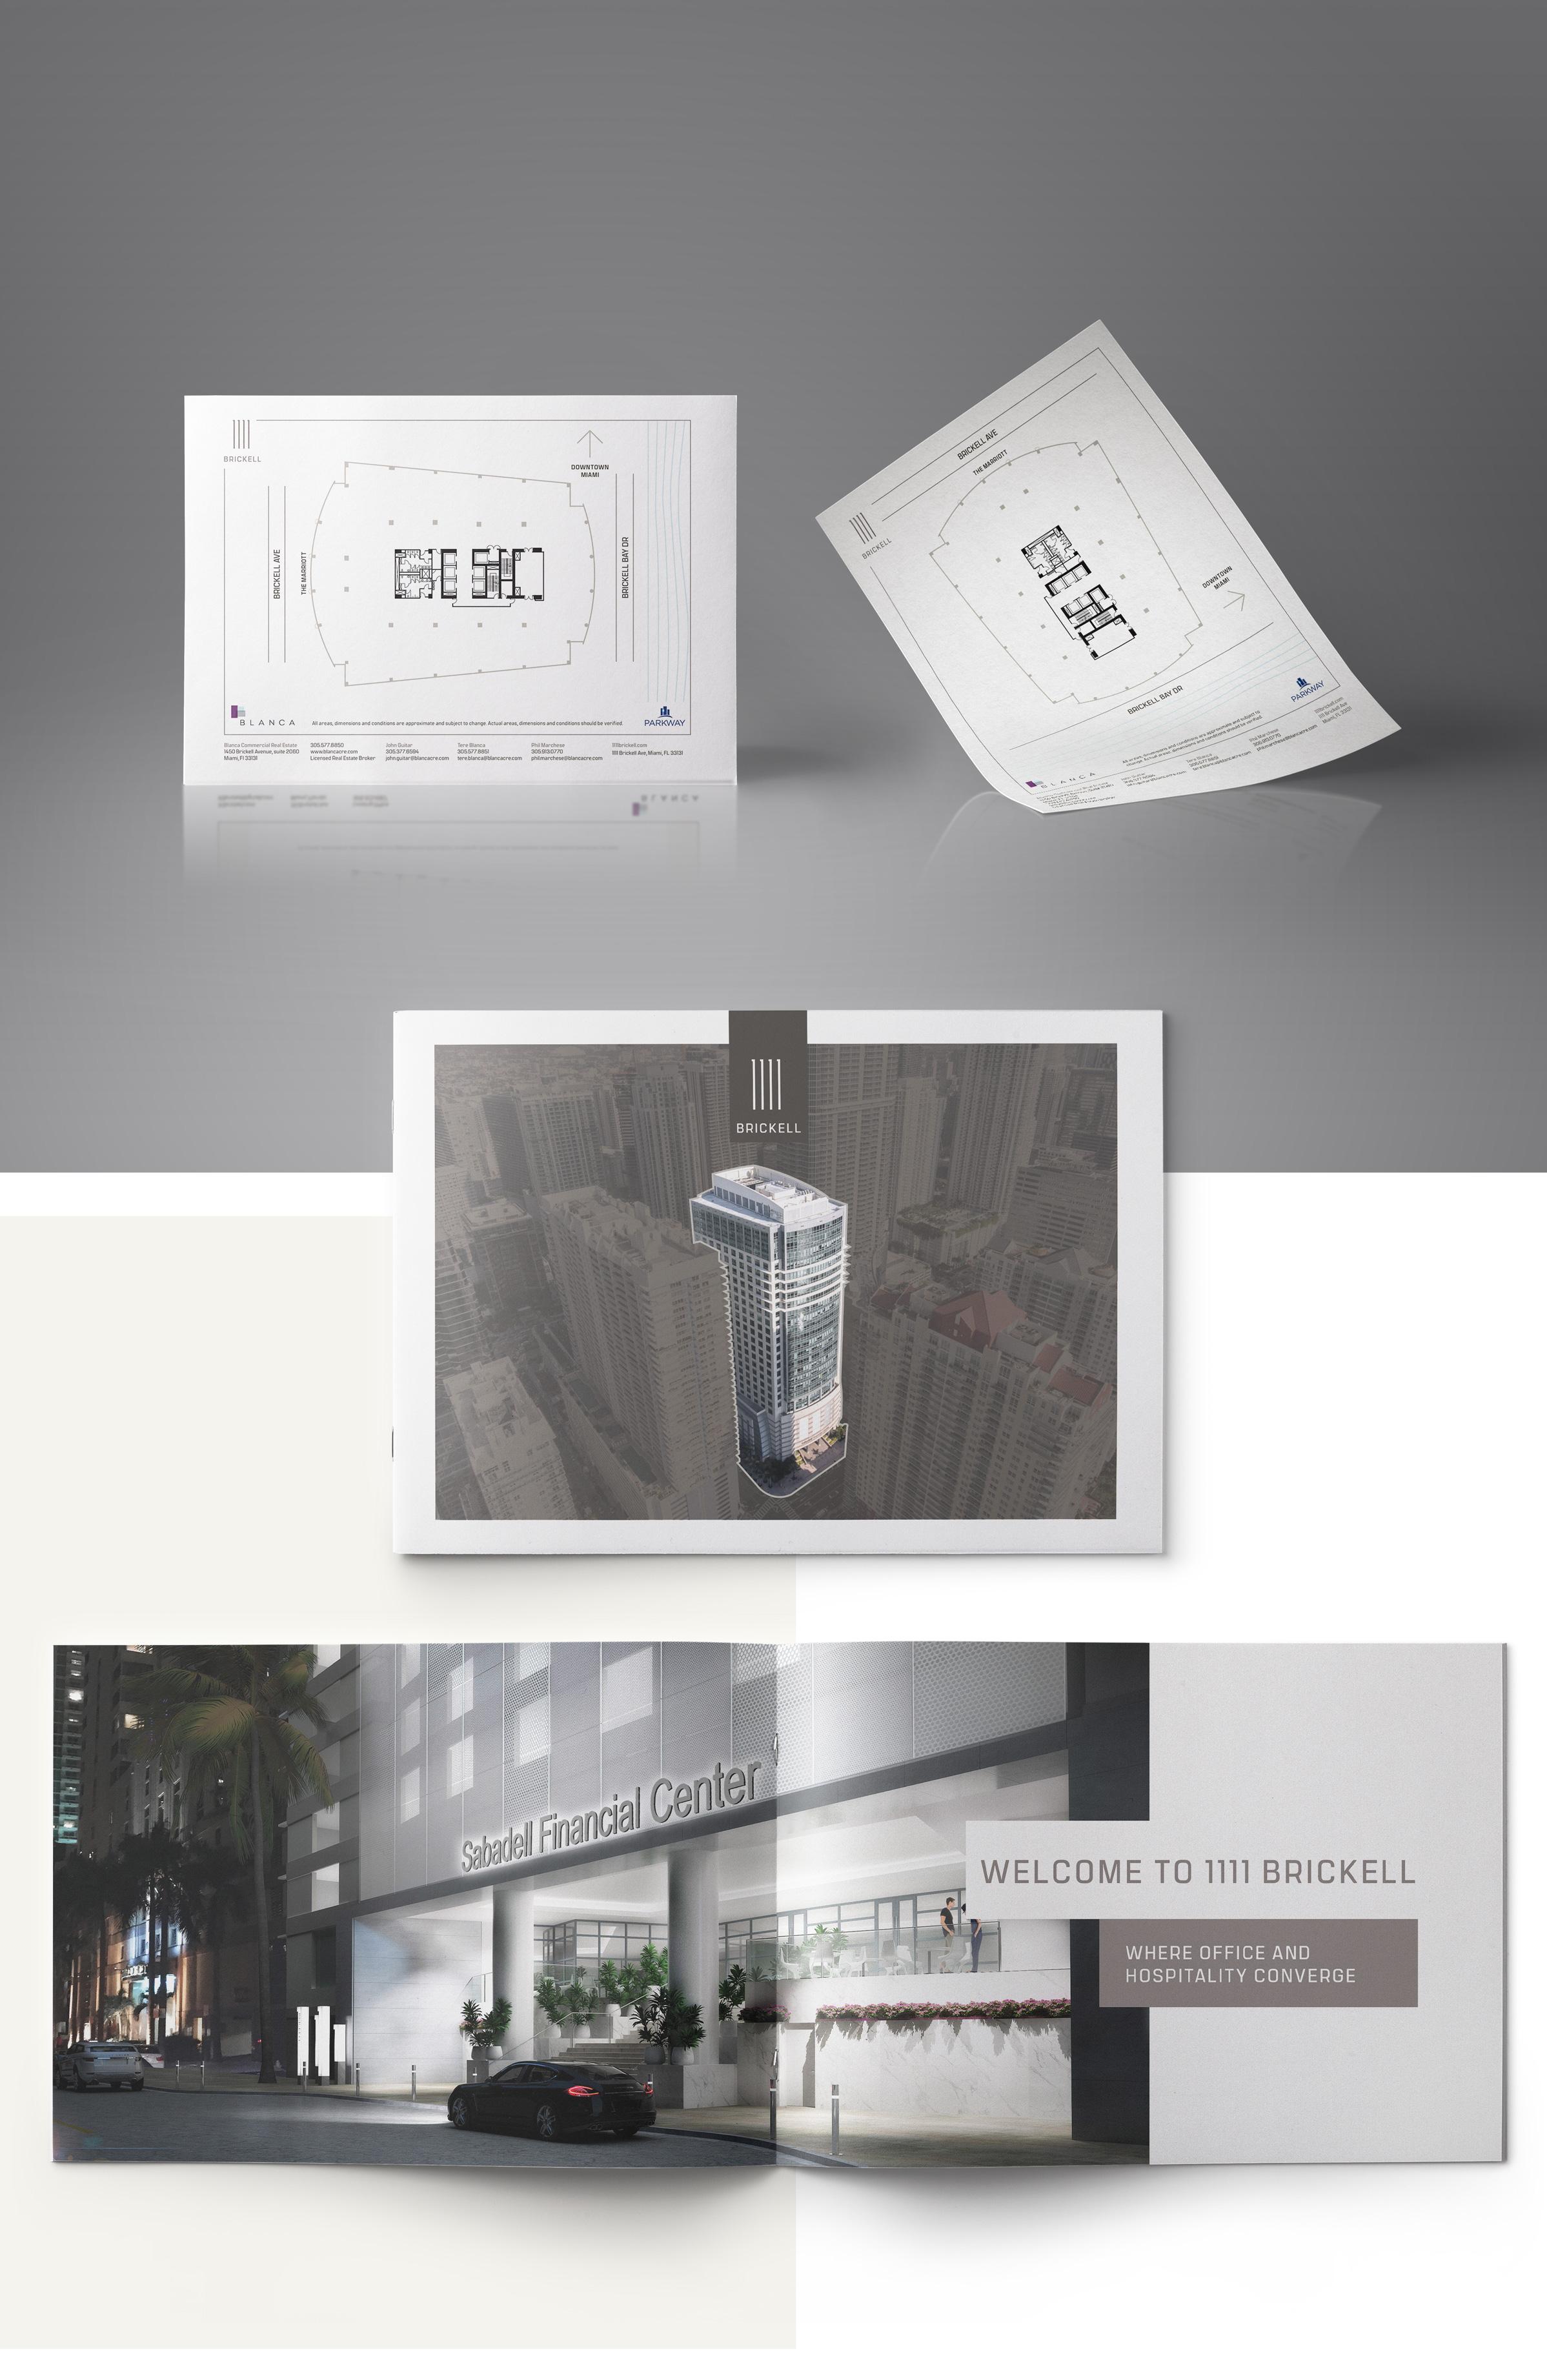 Ana-Juan-Gomez-1111-Brickell-branding-design.png